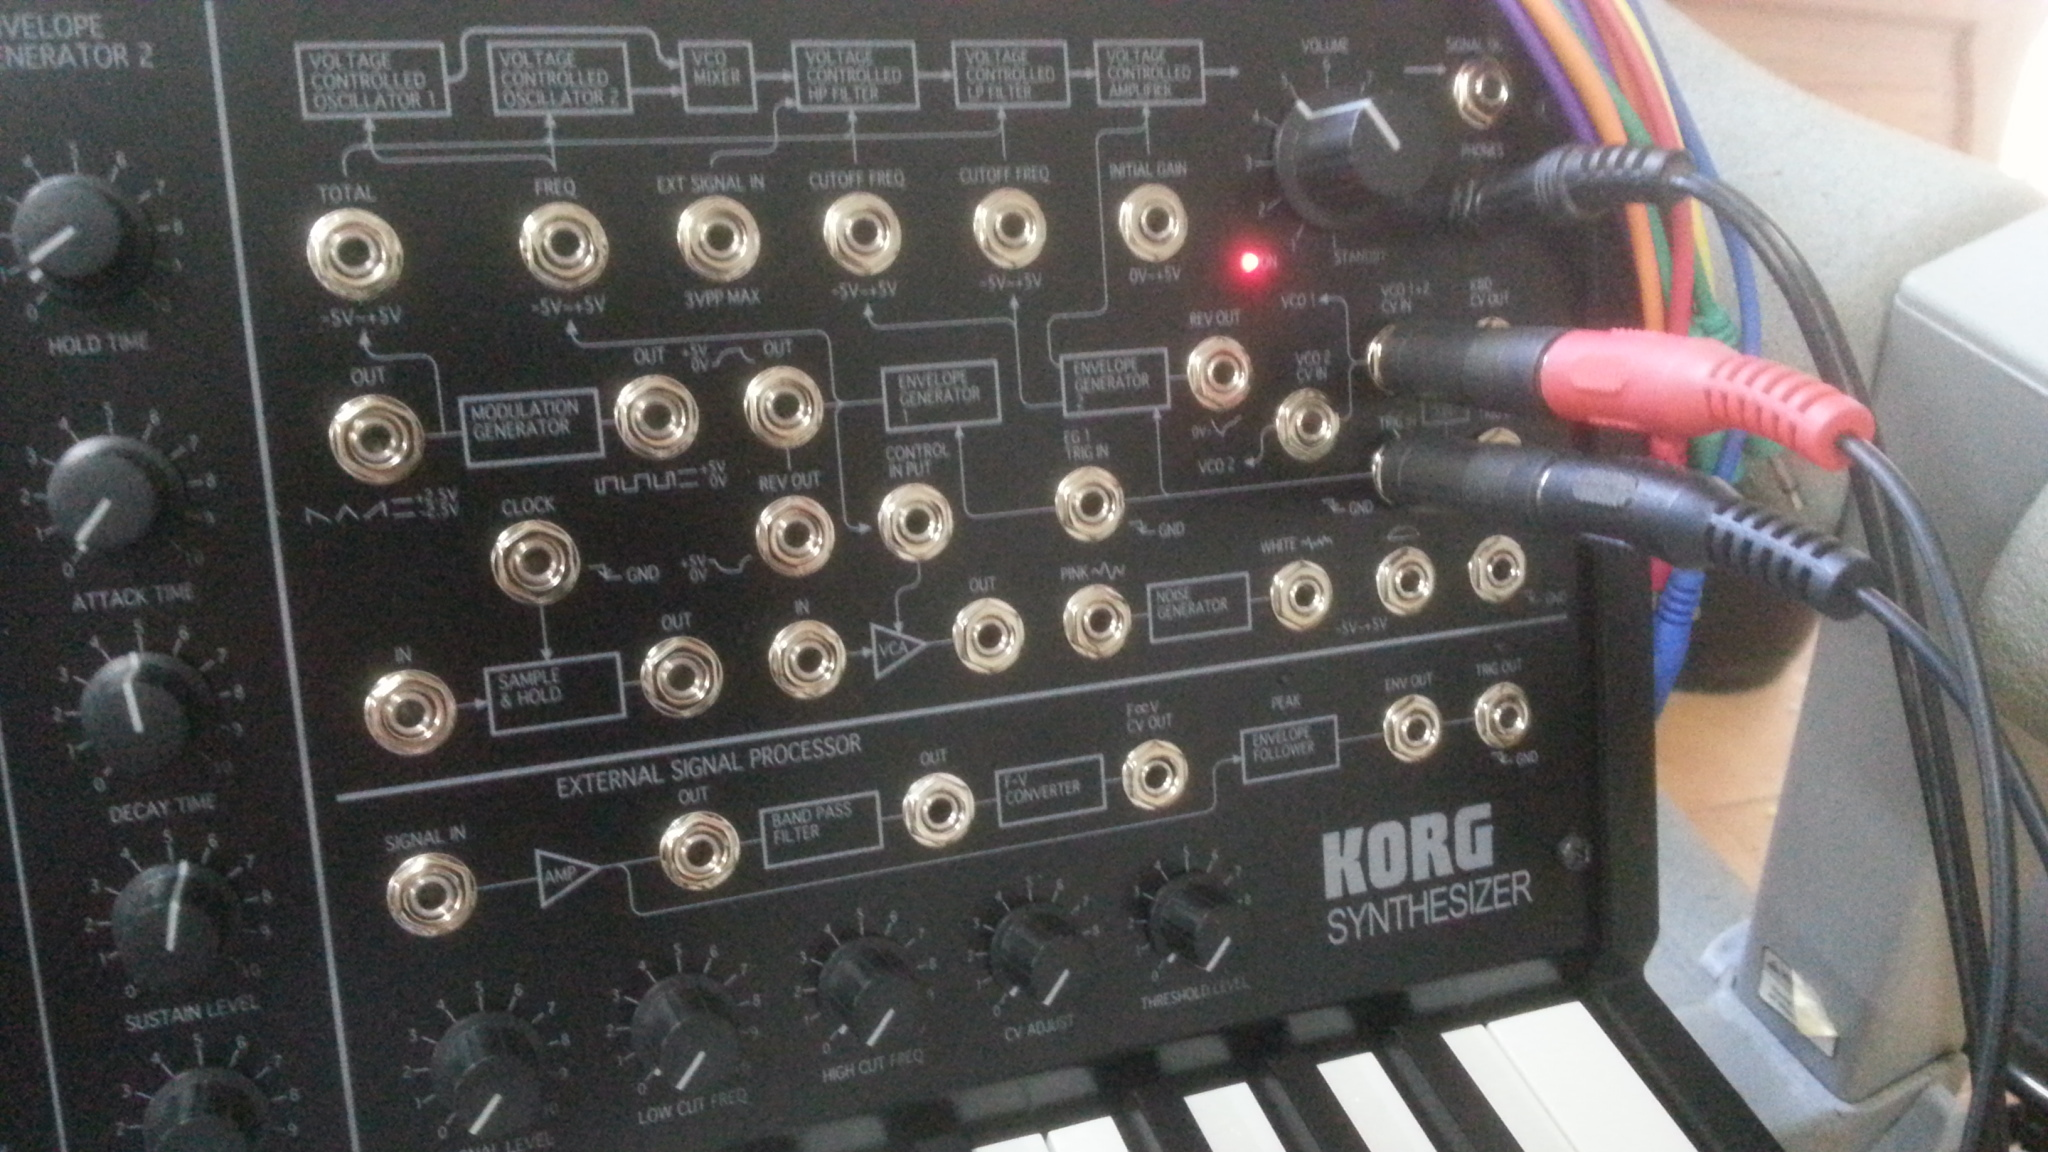 how to cv control minitaur  - analog keys  four